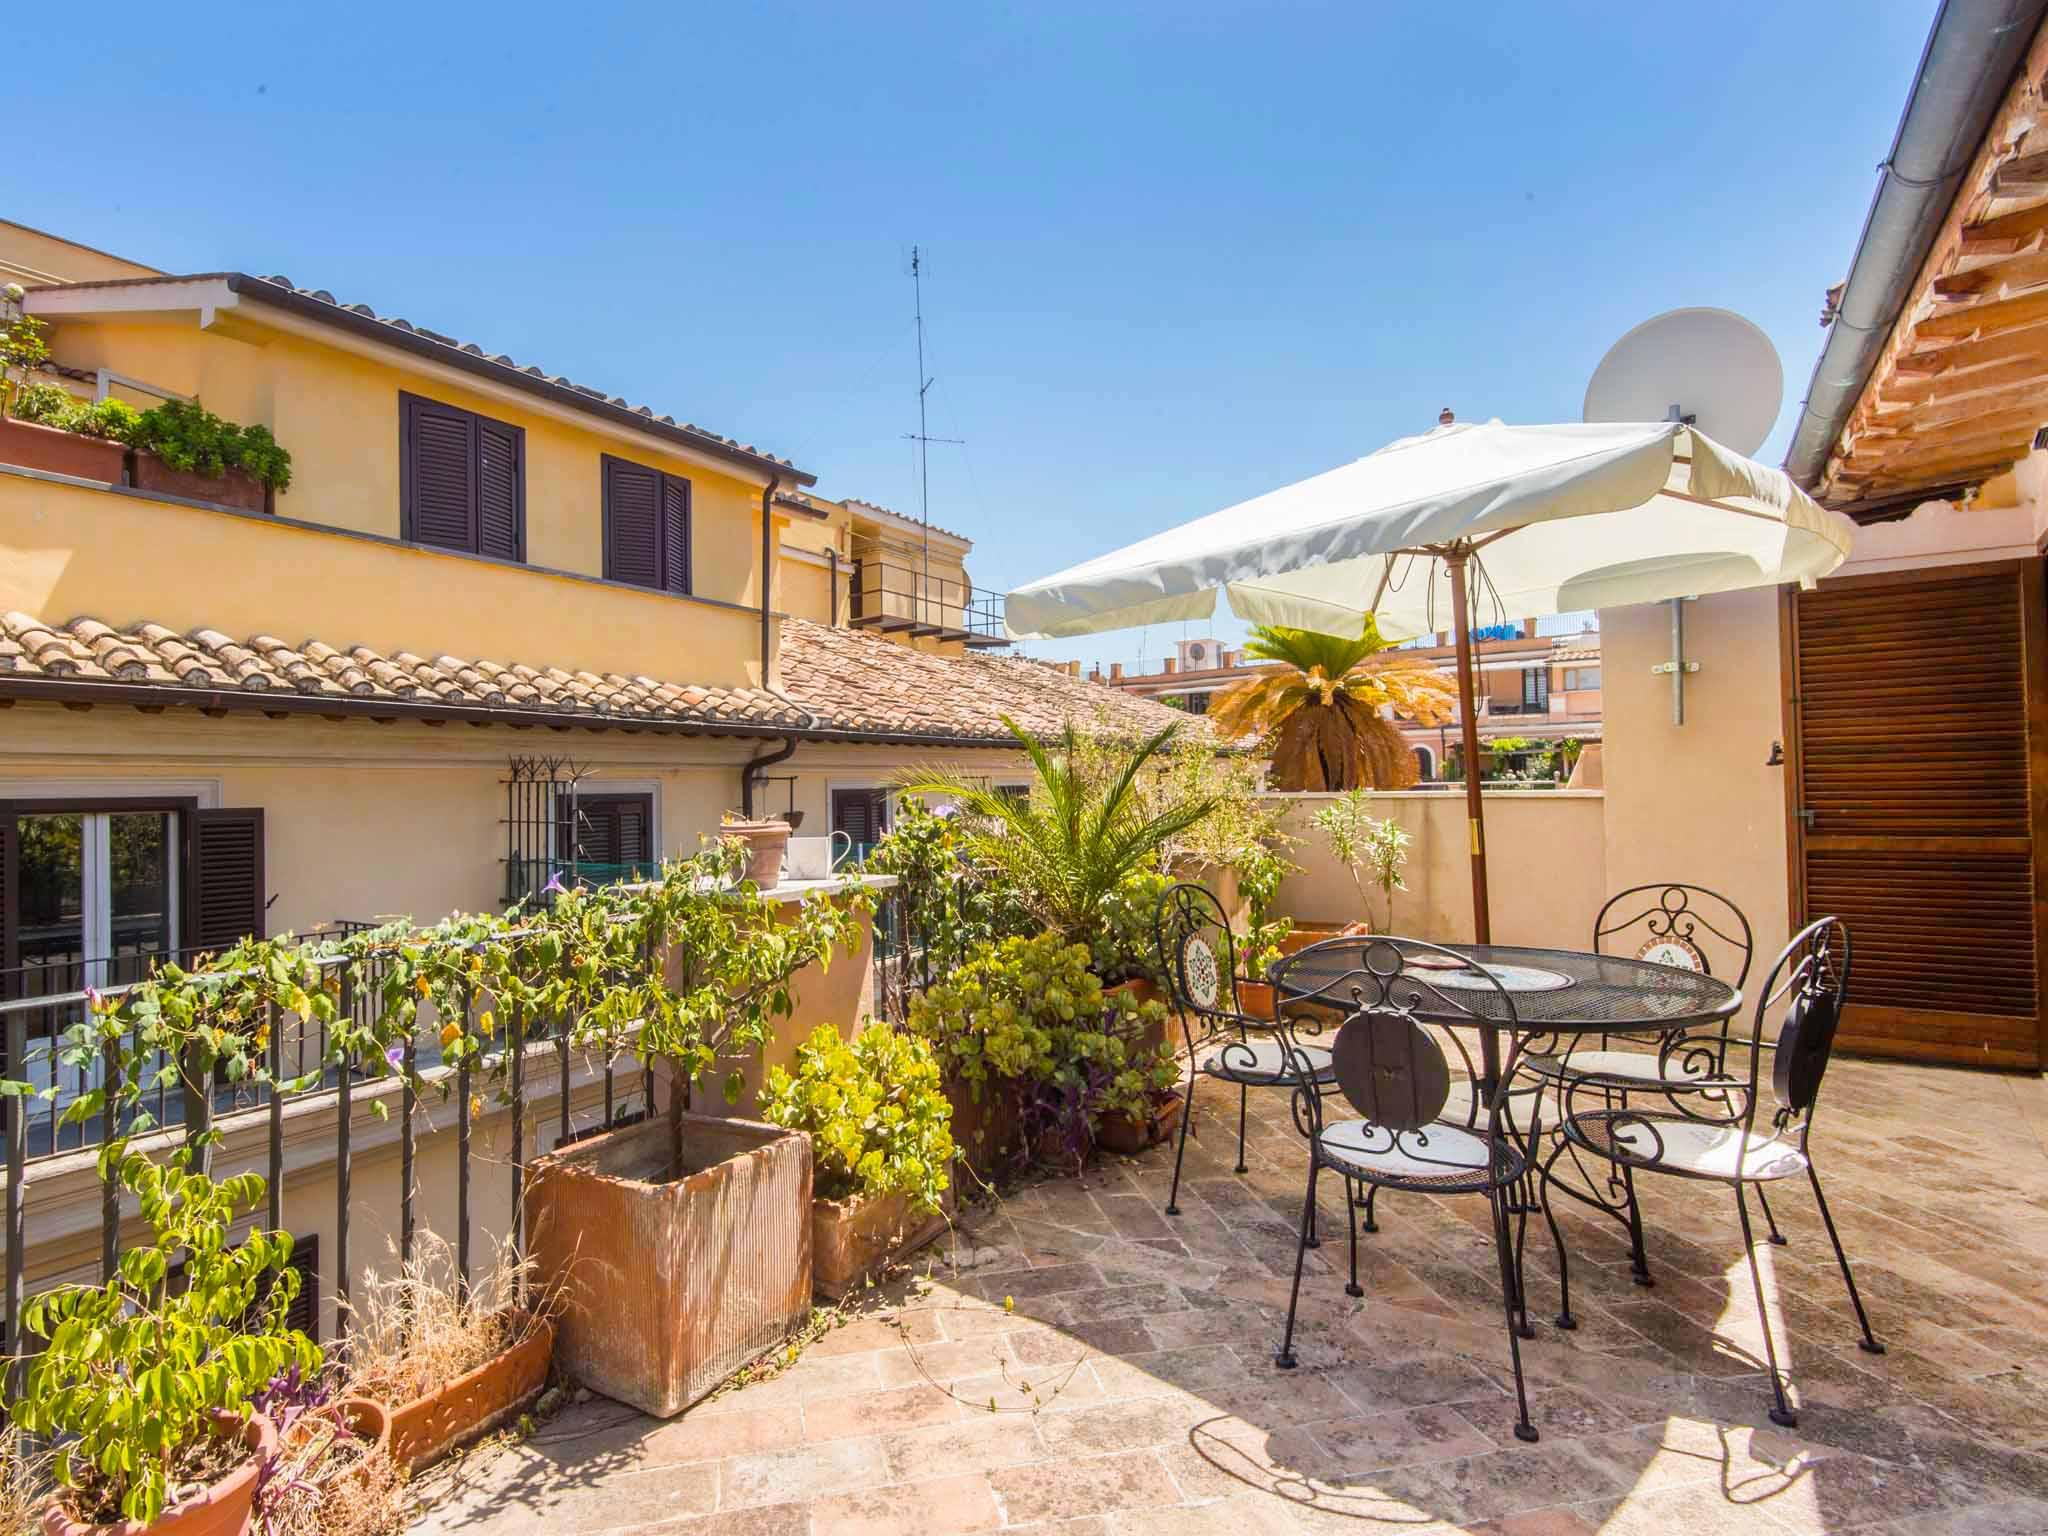 Apartment condotti terrace in rome historical city center for 702 weddings terrace